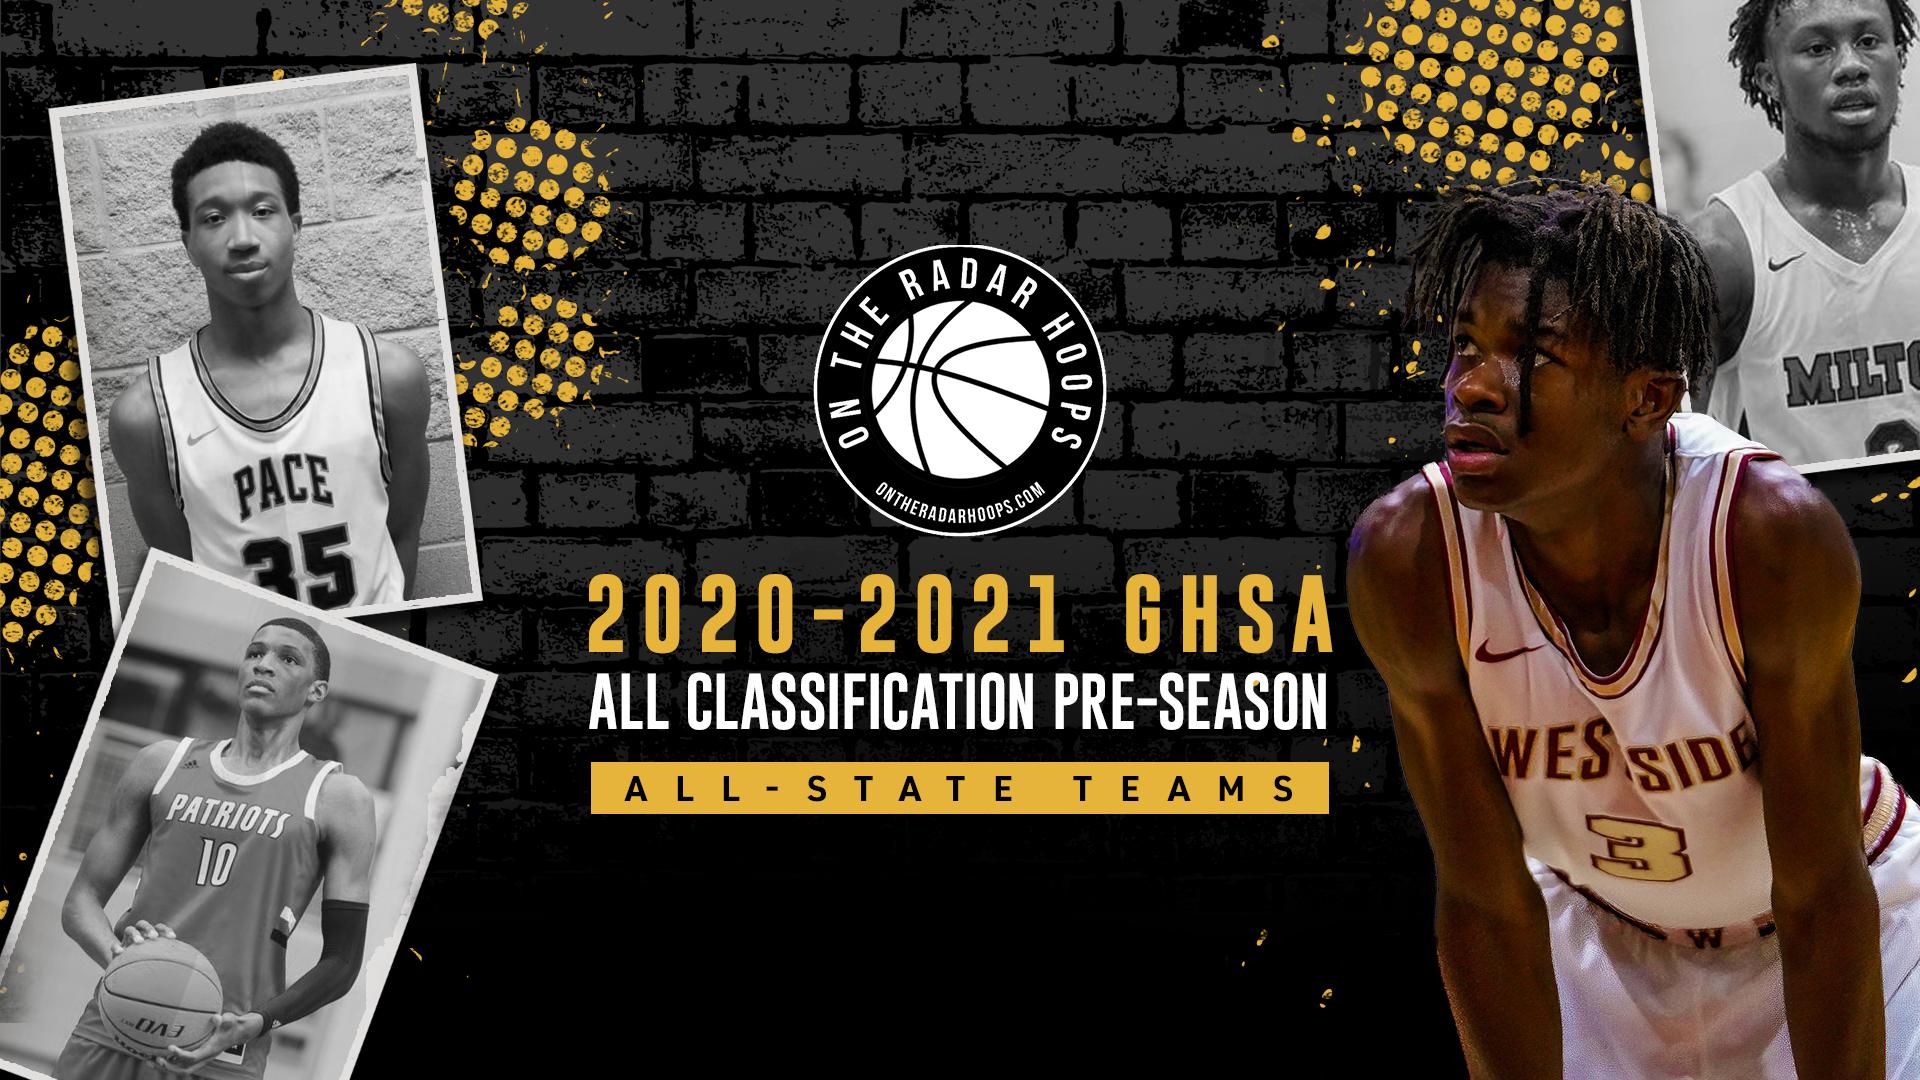 2020-21 GHSA All Classification Pre-Season All-State Teams